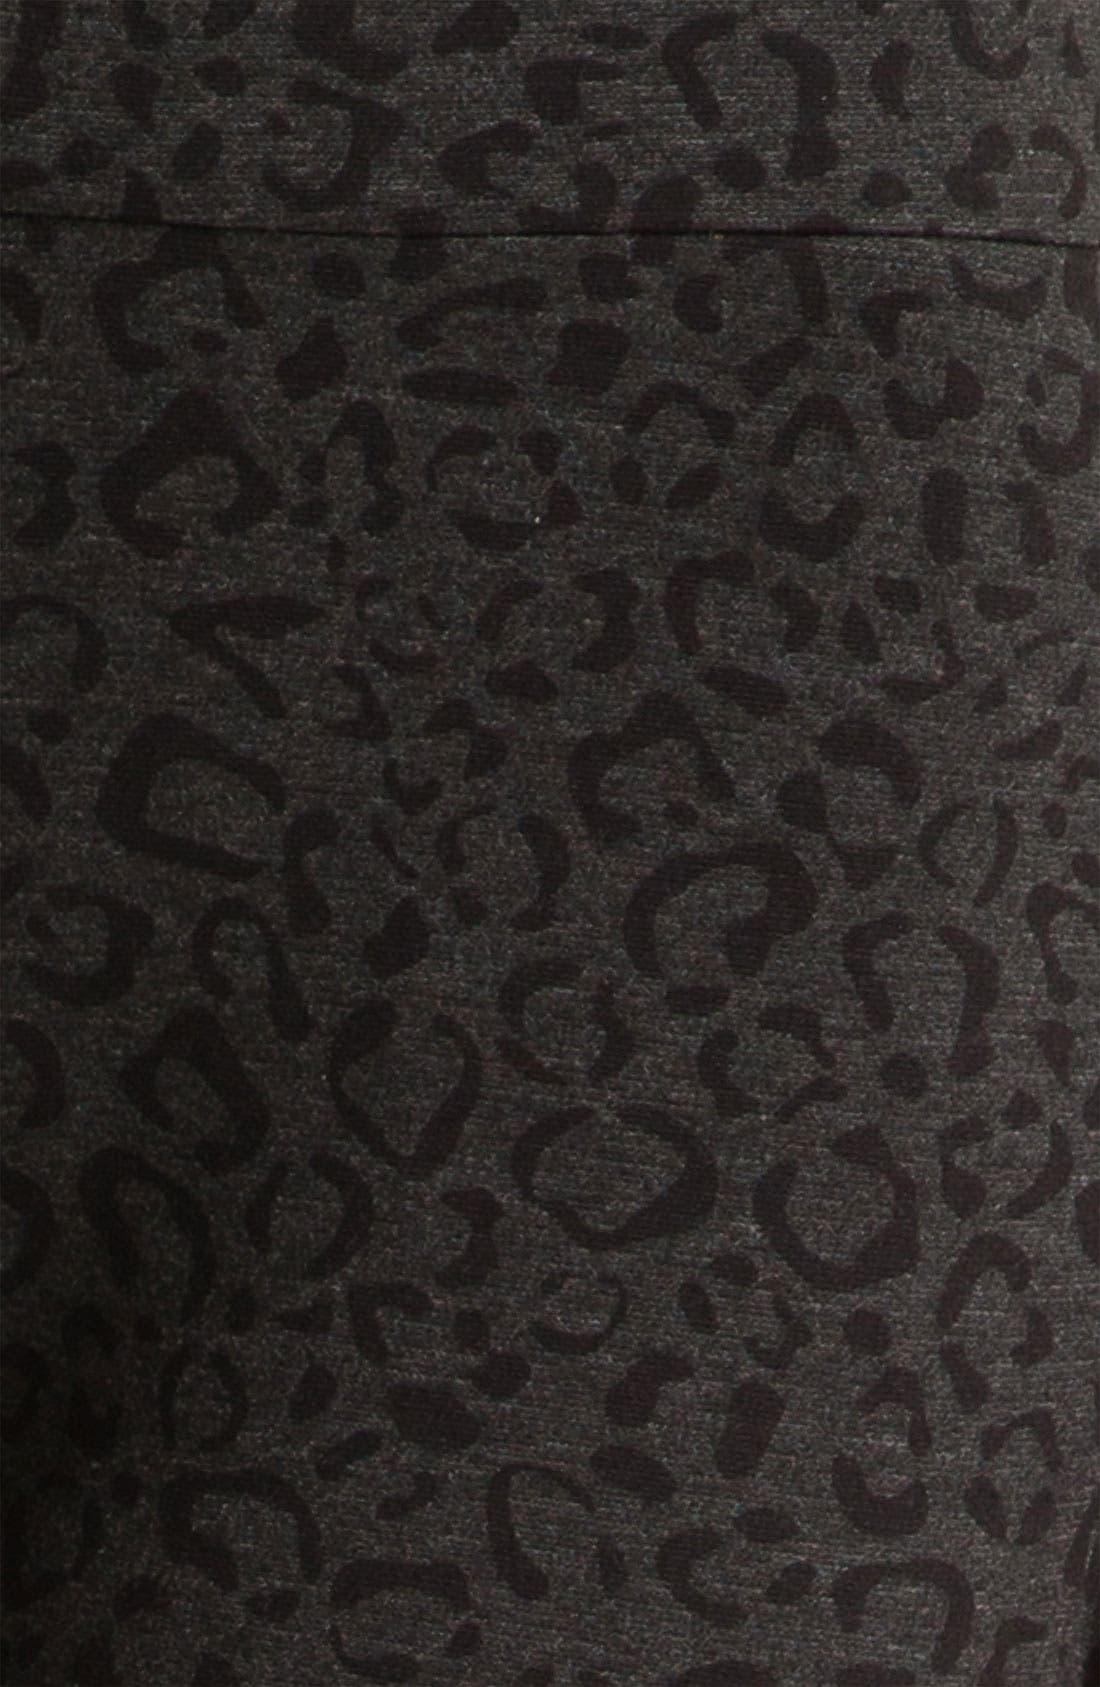 Alternate Image 3  - NYDJ Ocelot Print Ponte Pants (Petite)